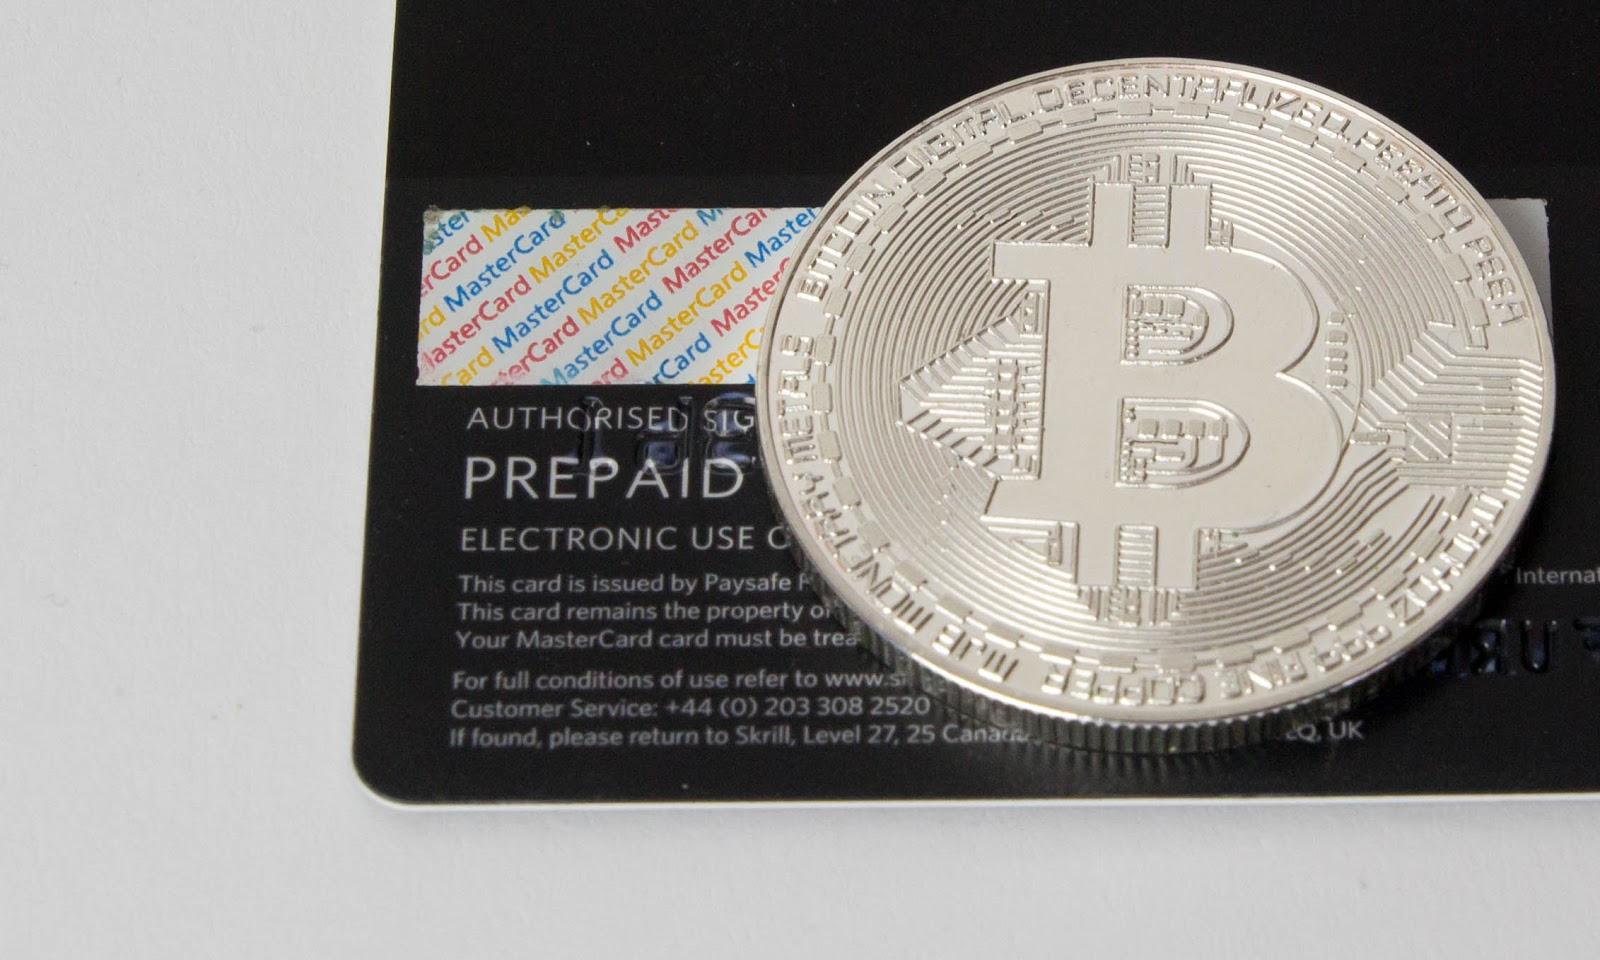 Acheter des bitcoins avec paysafecard prepaid patriots point differential betting